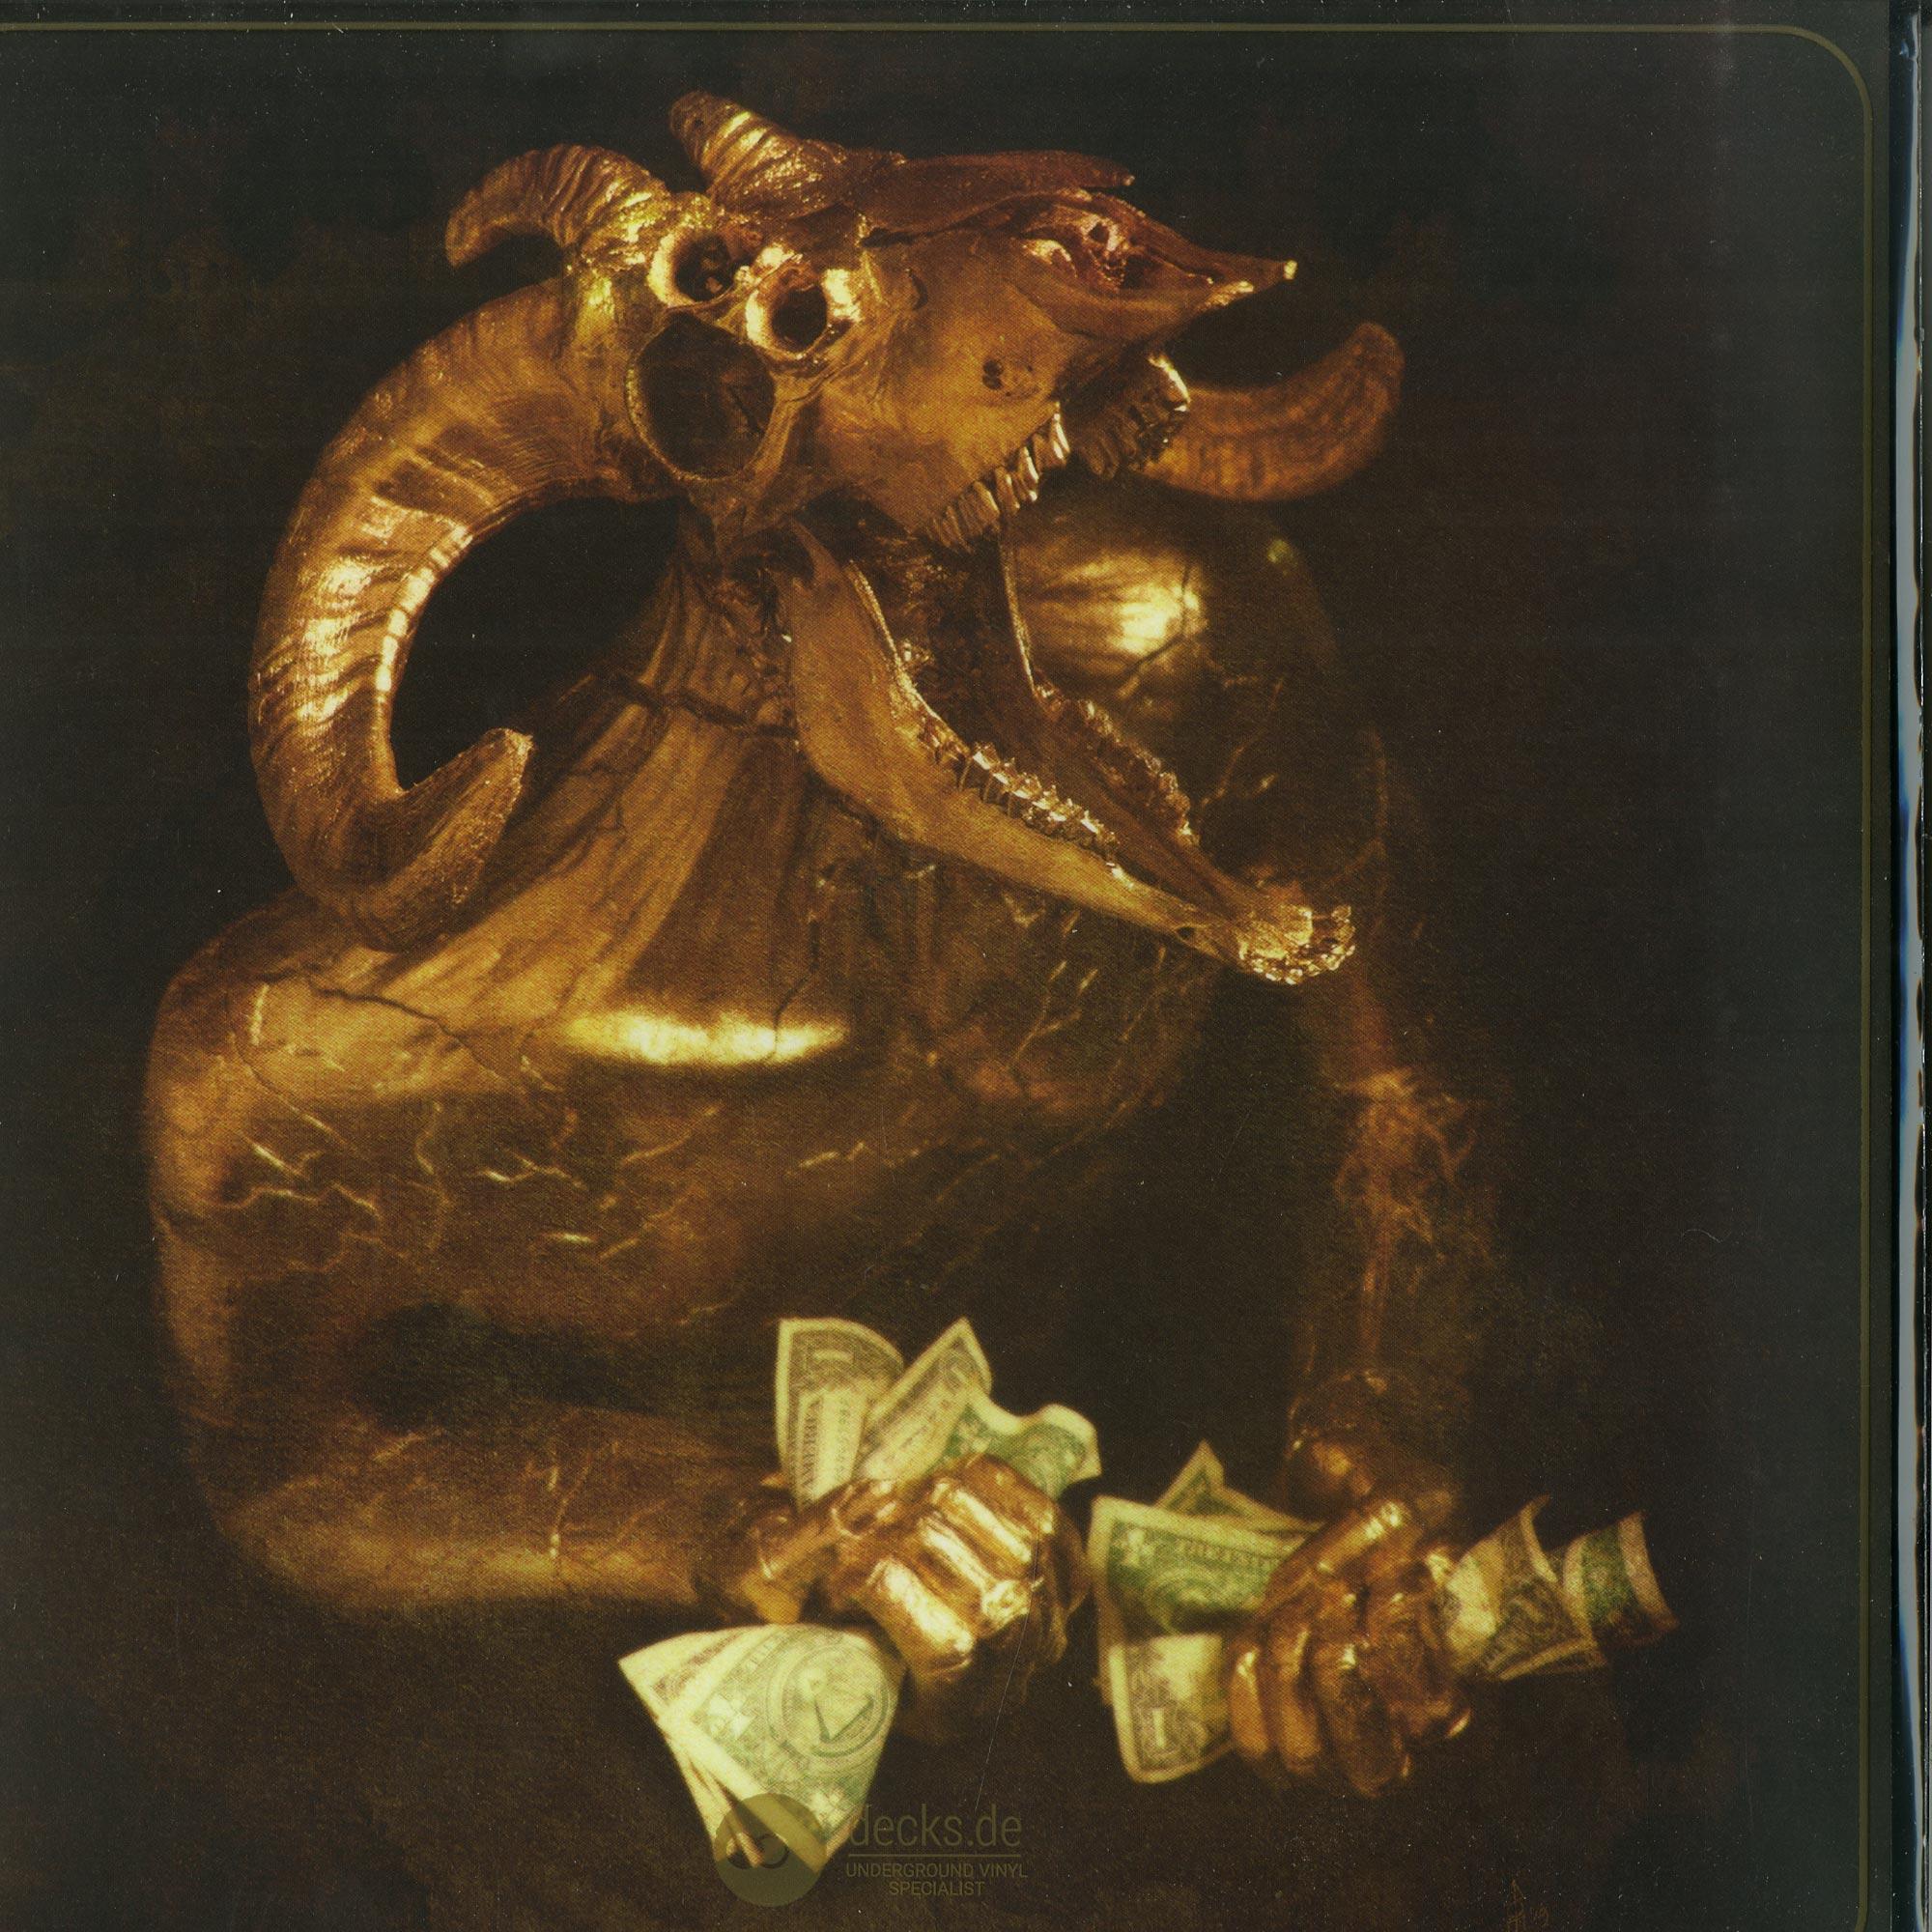 The Satan - GANGZTA CASH EP